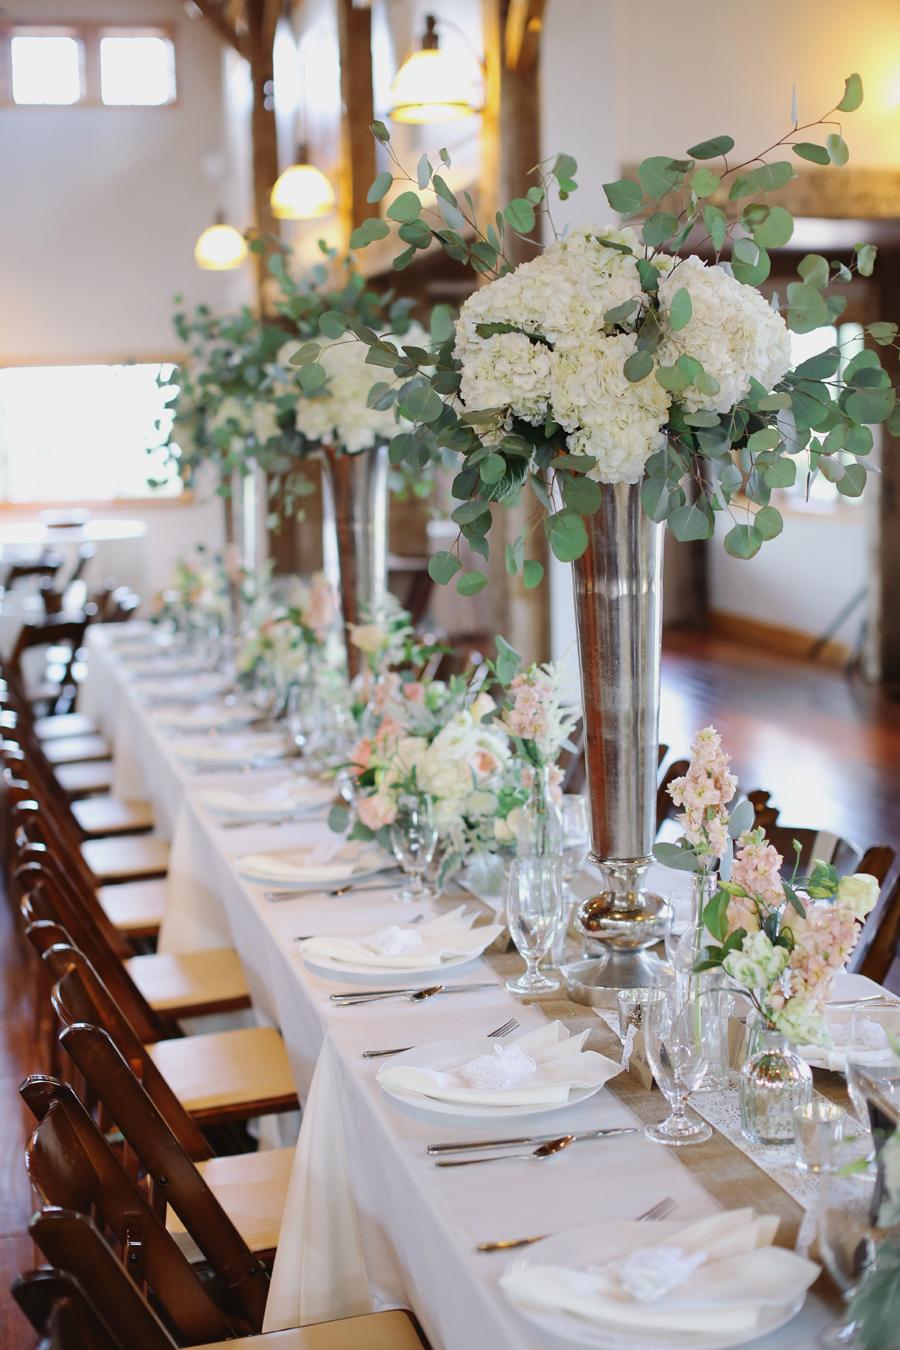 wedding flowers centerpieces ideas photo - 1